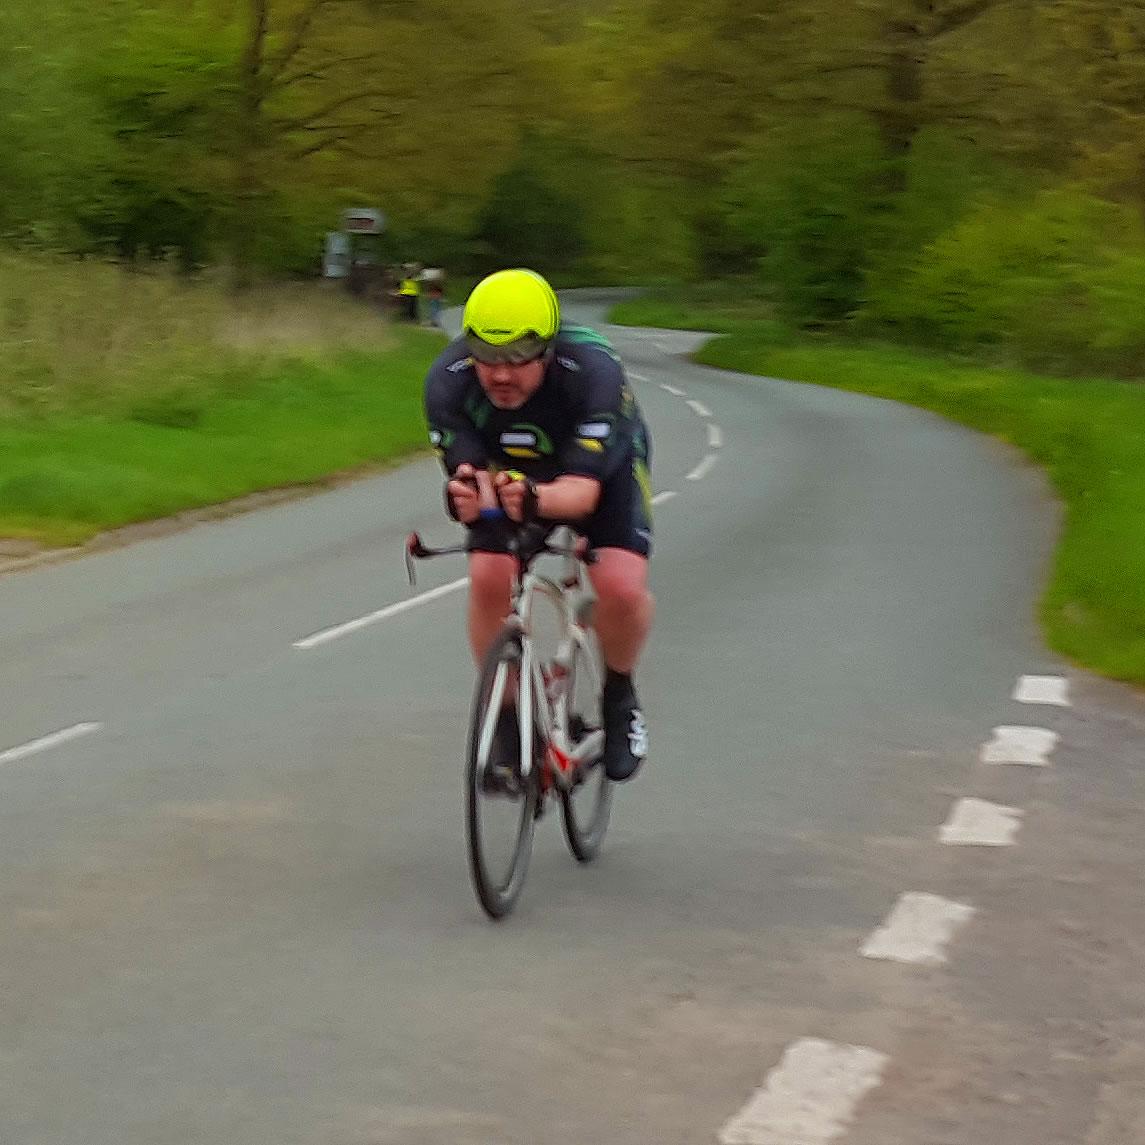 paul cheers runcorn cycle club